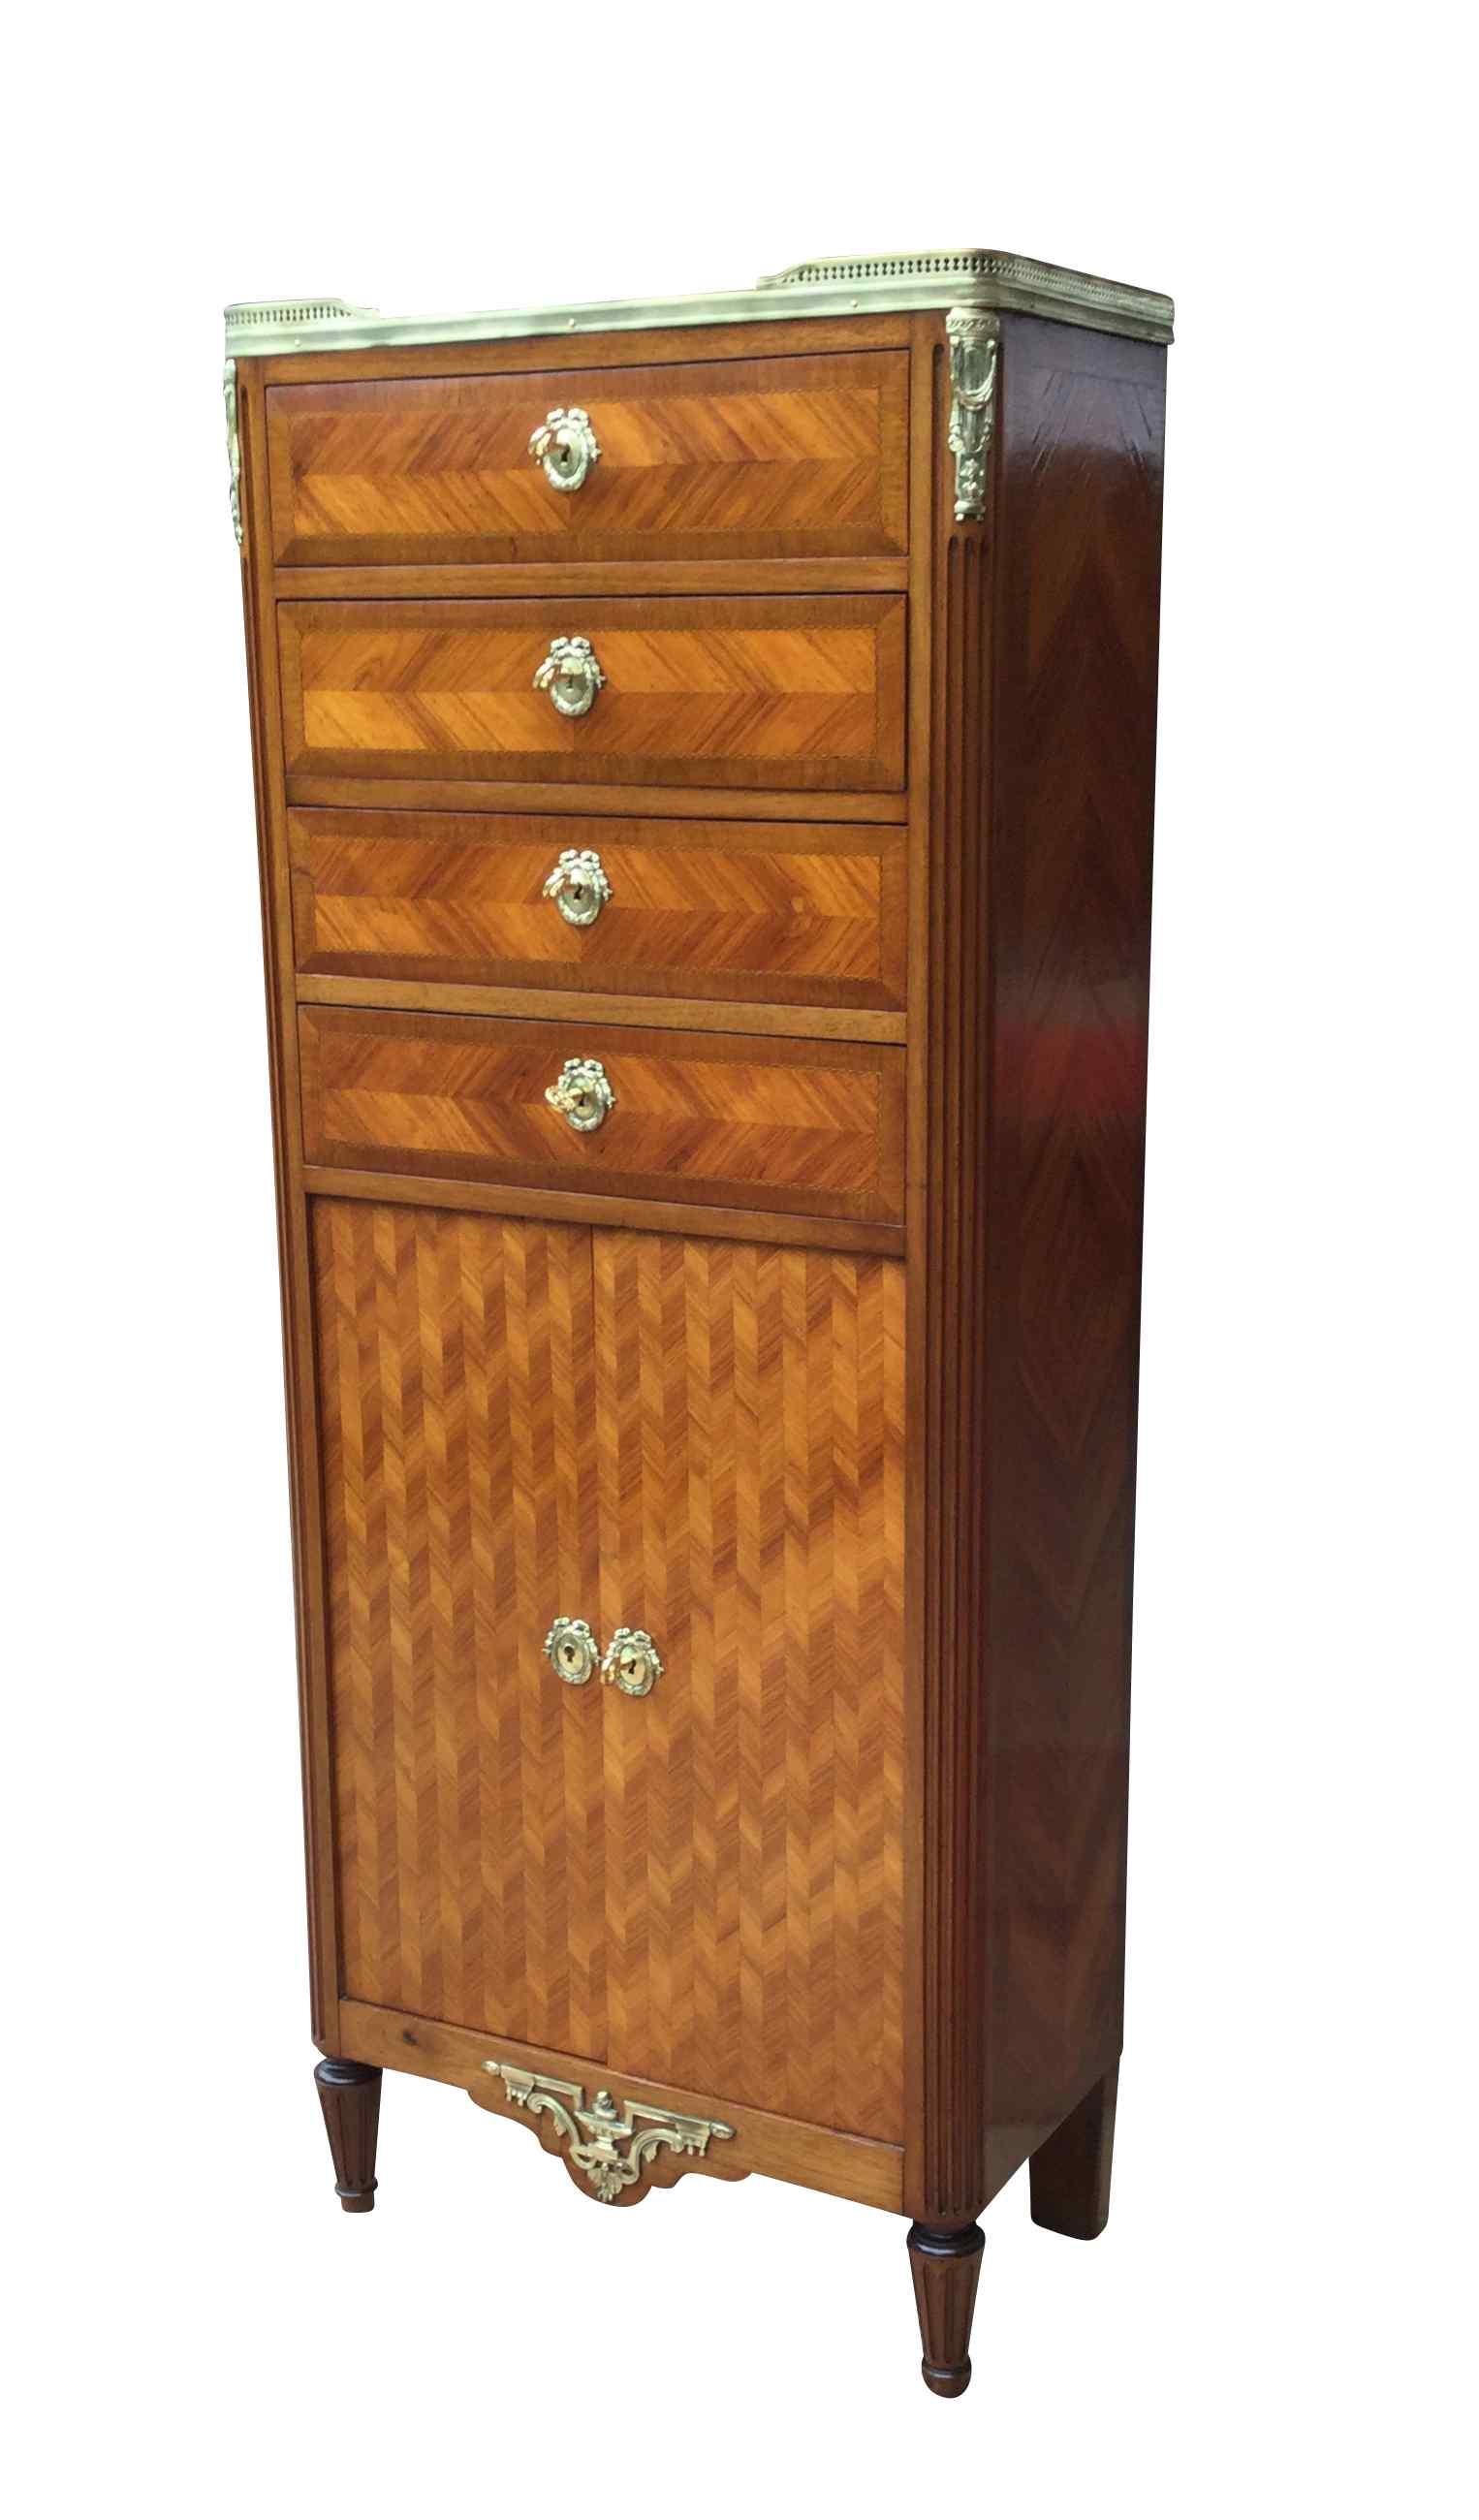 meuble commode deux portes style louis xvi